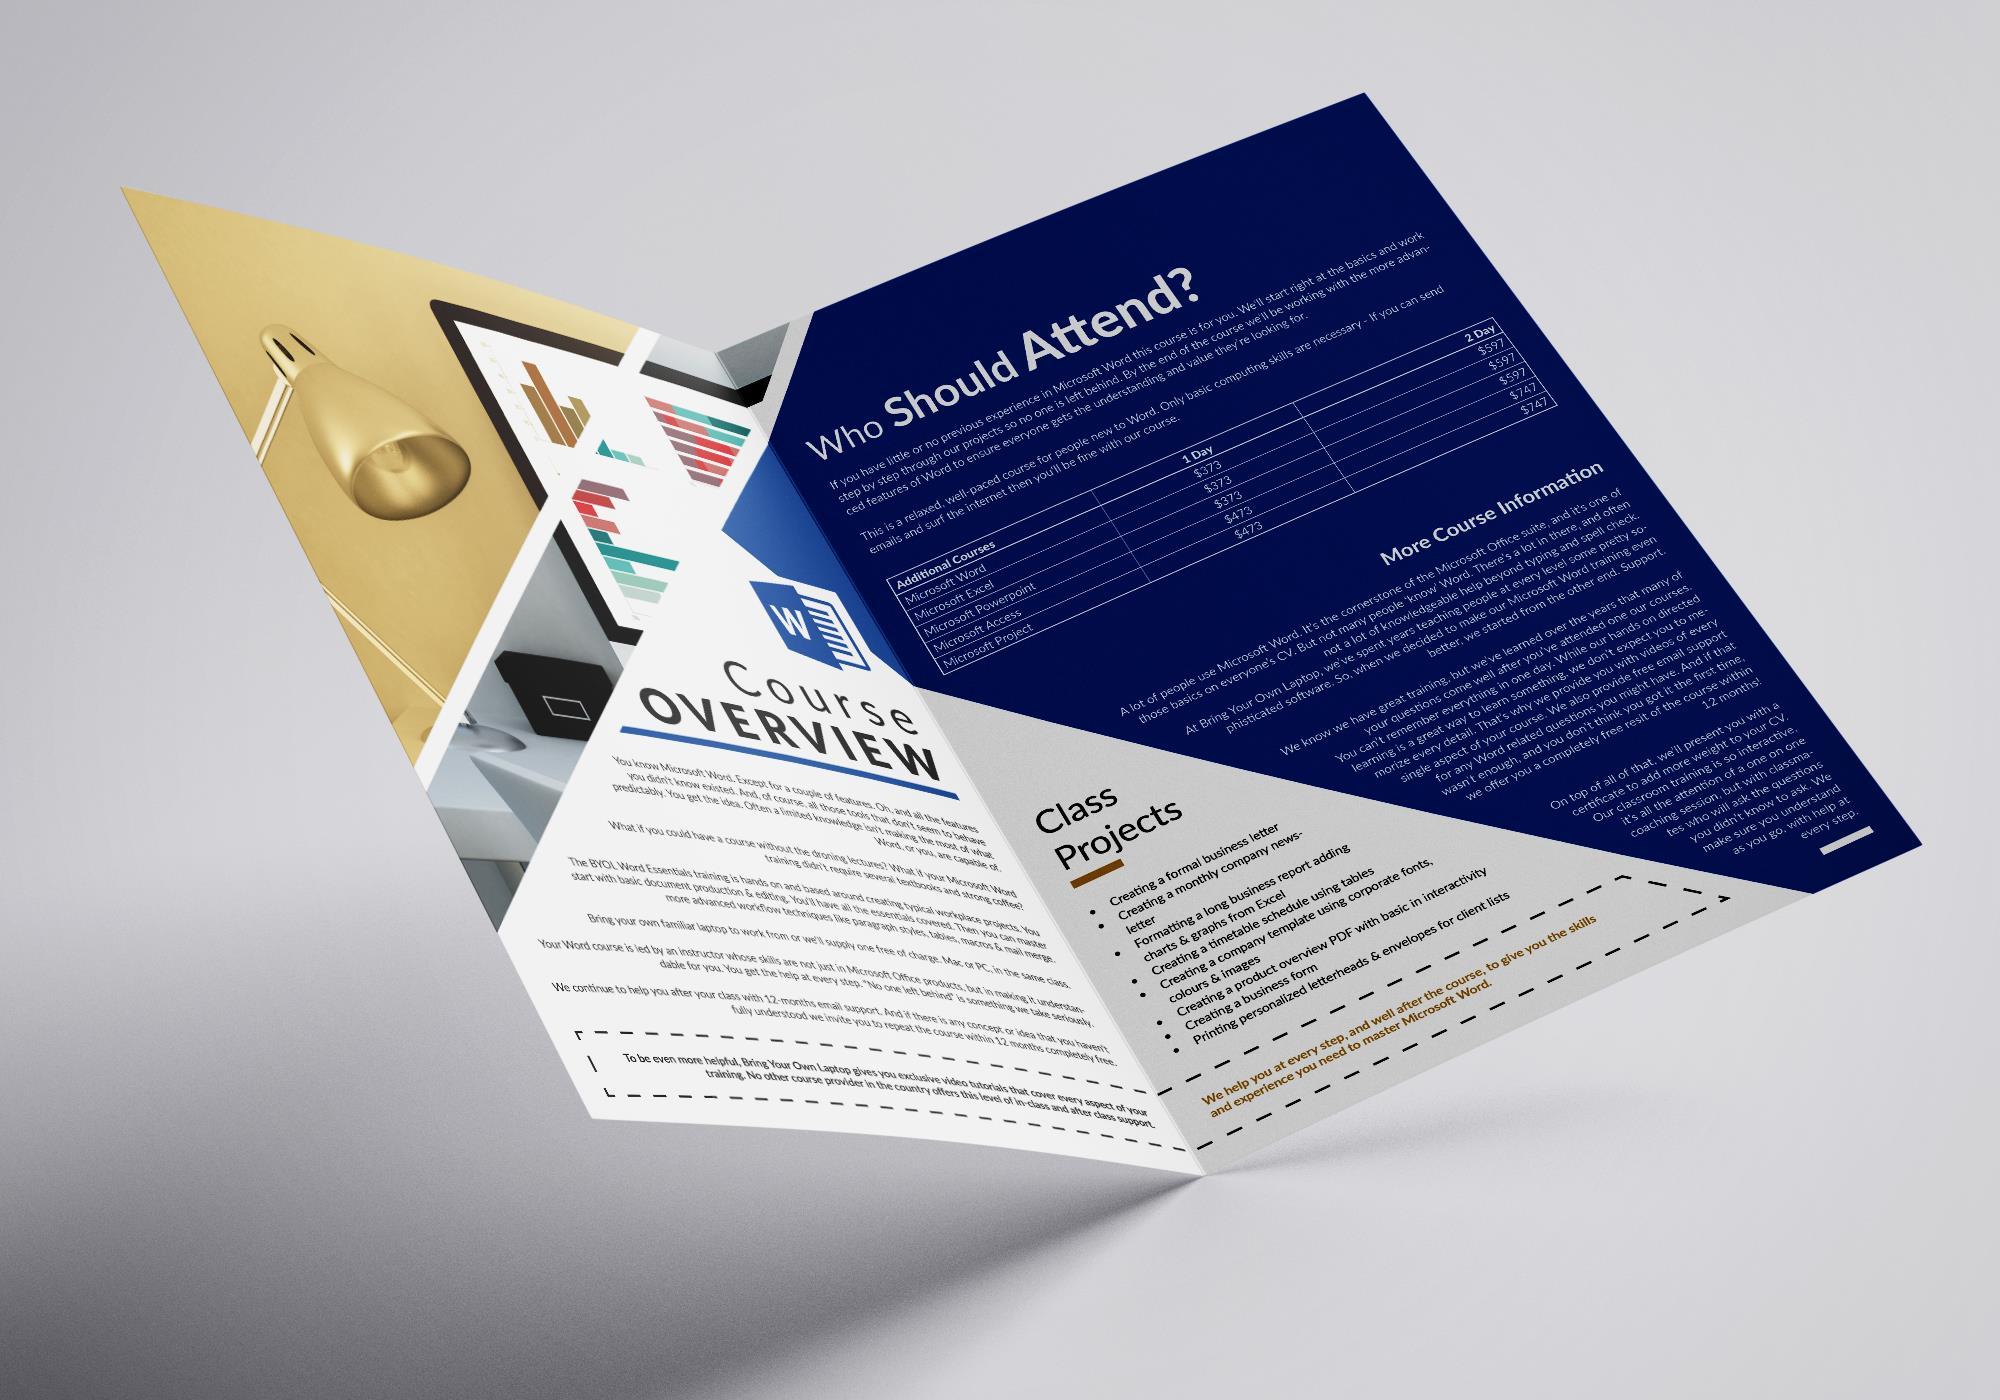 -wordkurs-folder-32000×1400